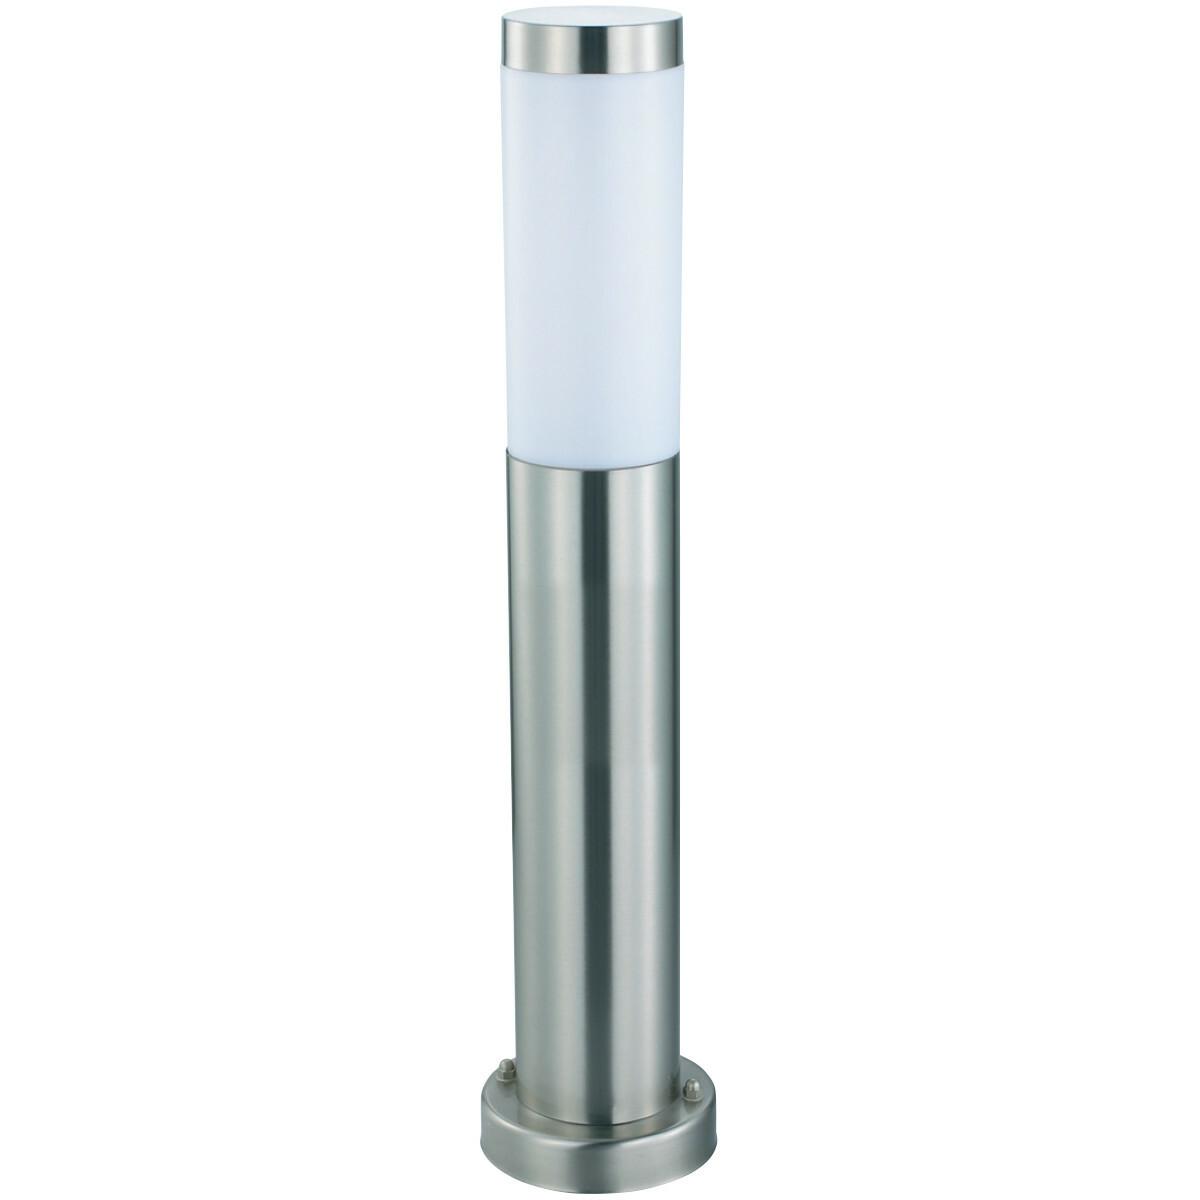 PHILIPS - LED Tuinverlichting - Staande Buitenlamp - CorePro Lustre 827 P45 FR - Laurea 4 - E27 Fitt